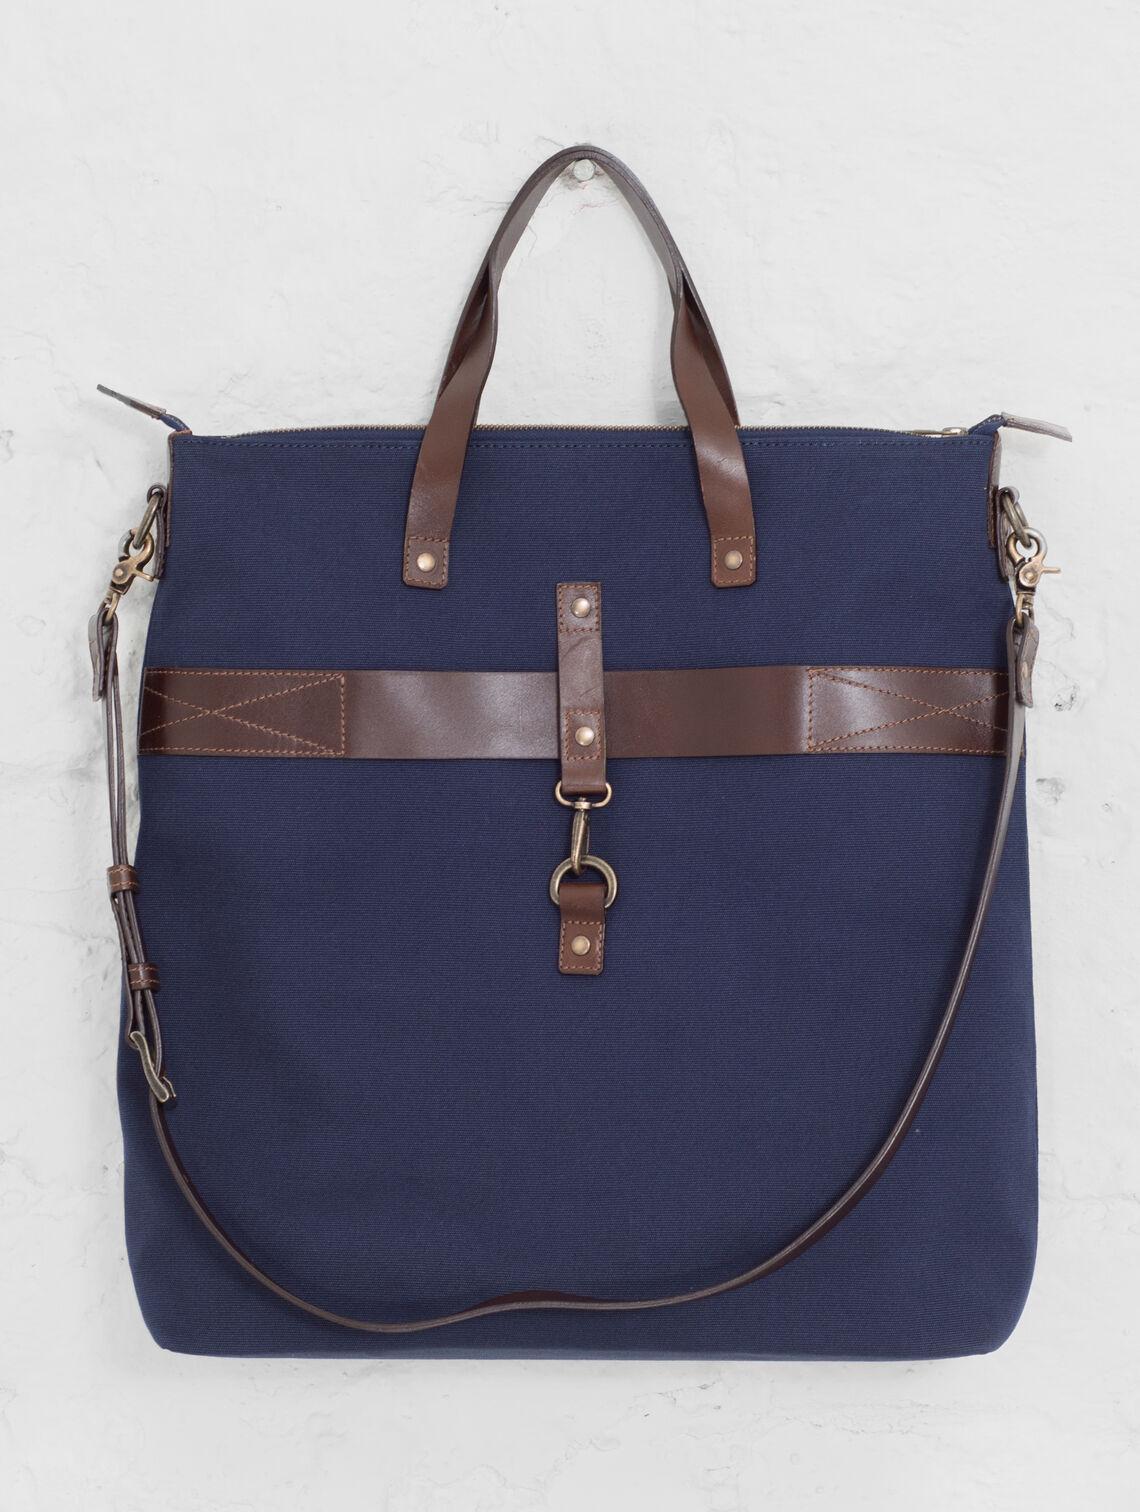 Traveller Canvas Bag dark blue   cognac   brass  2bb21bf137411